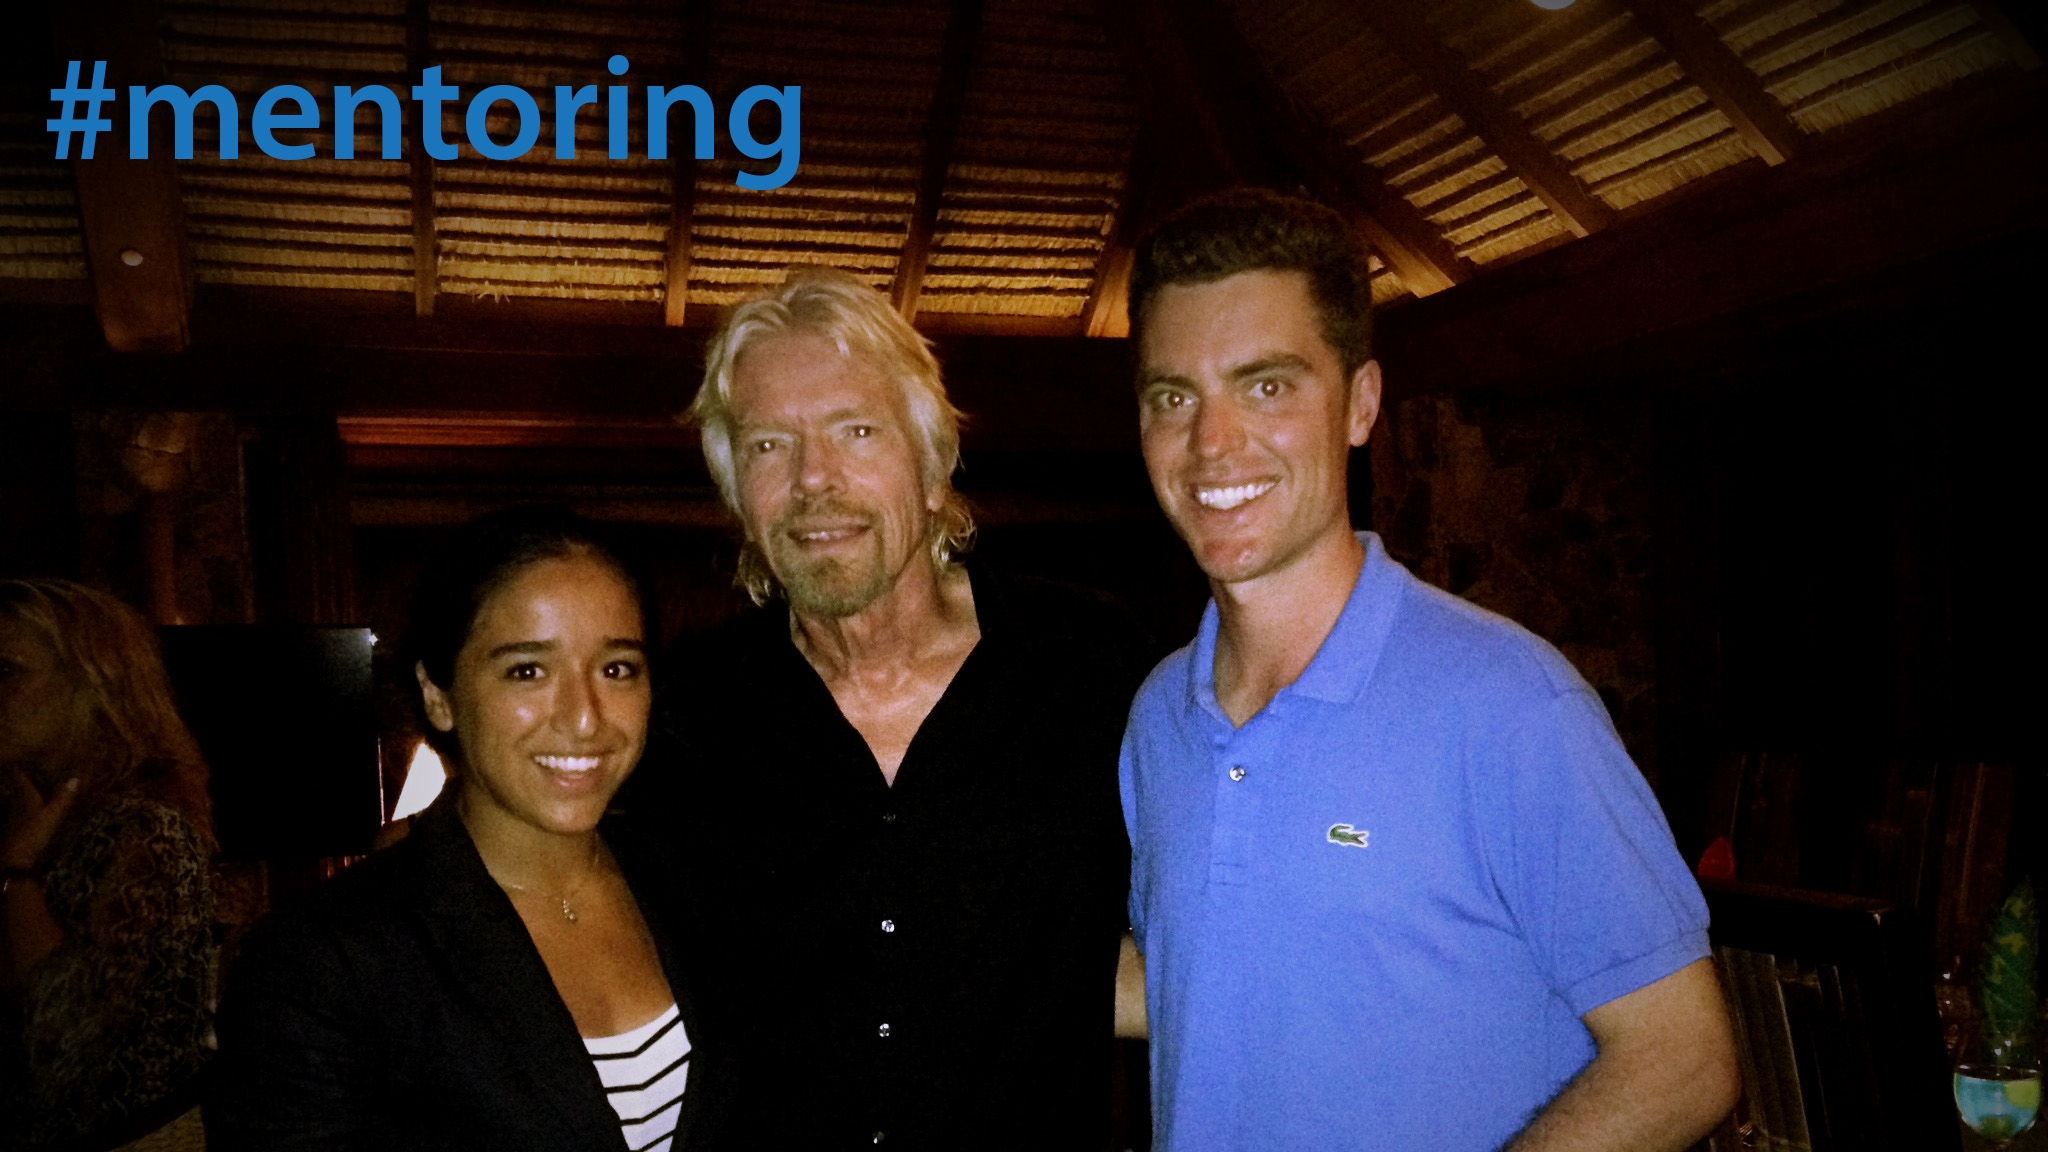 mentoringNicole.jpg